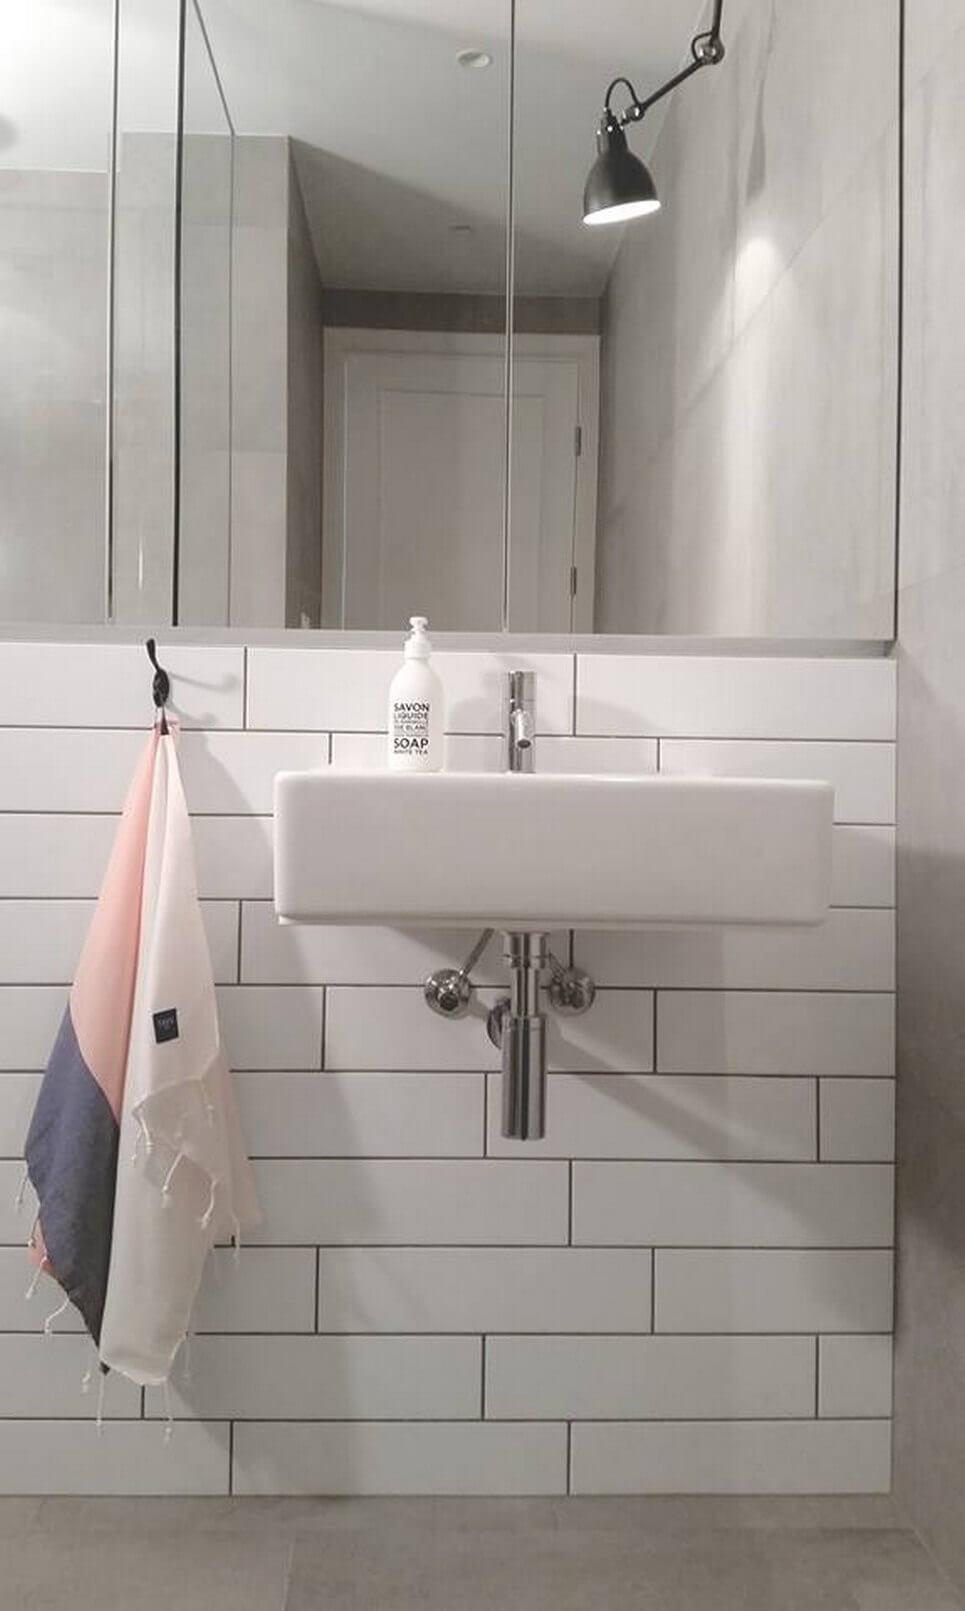 Sjo Kitchen Hand Towel – 2